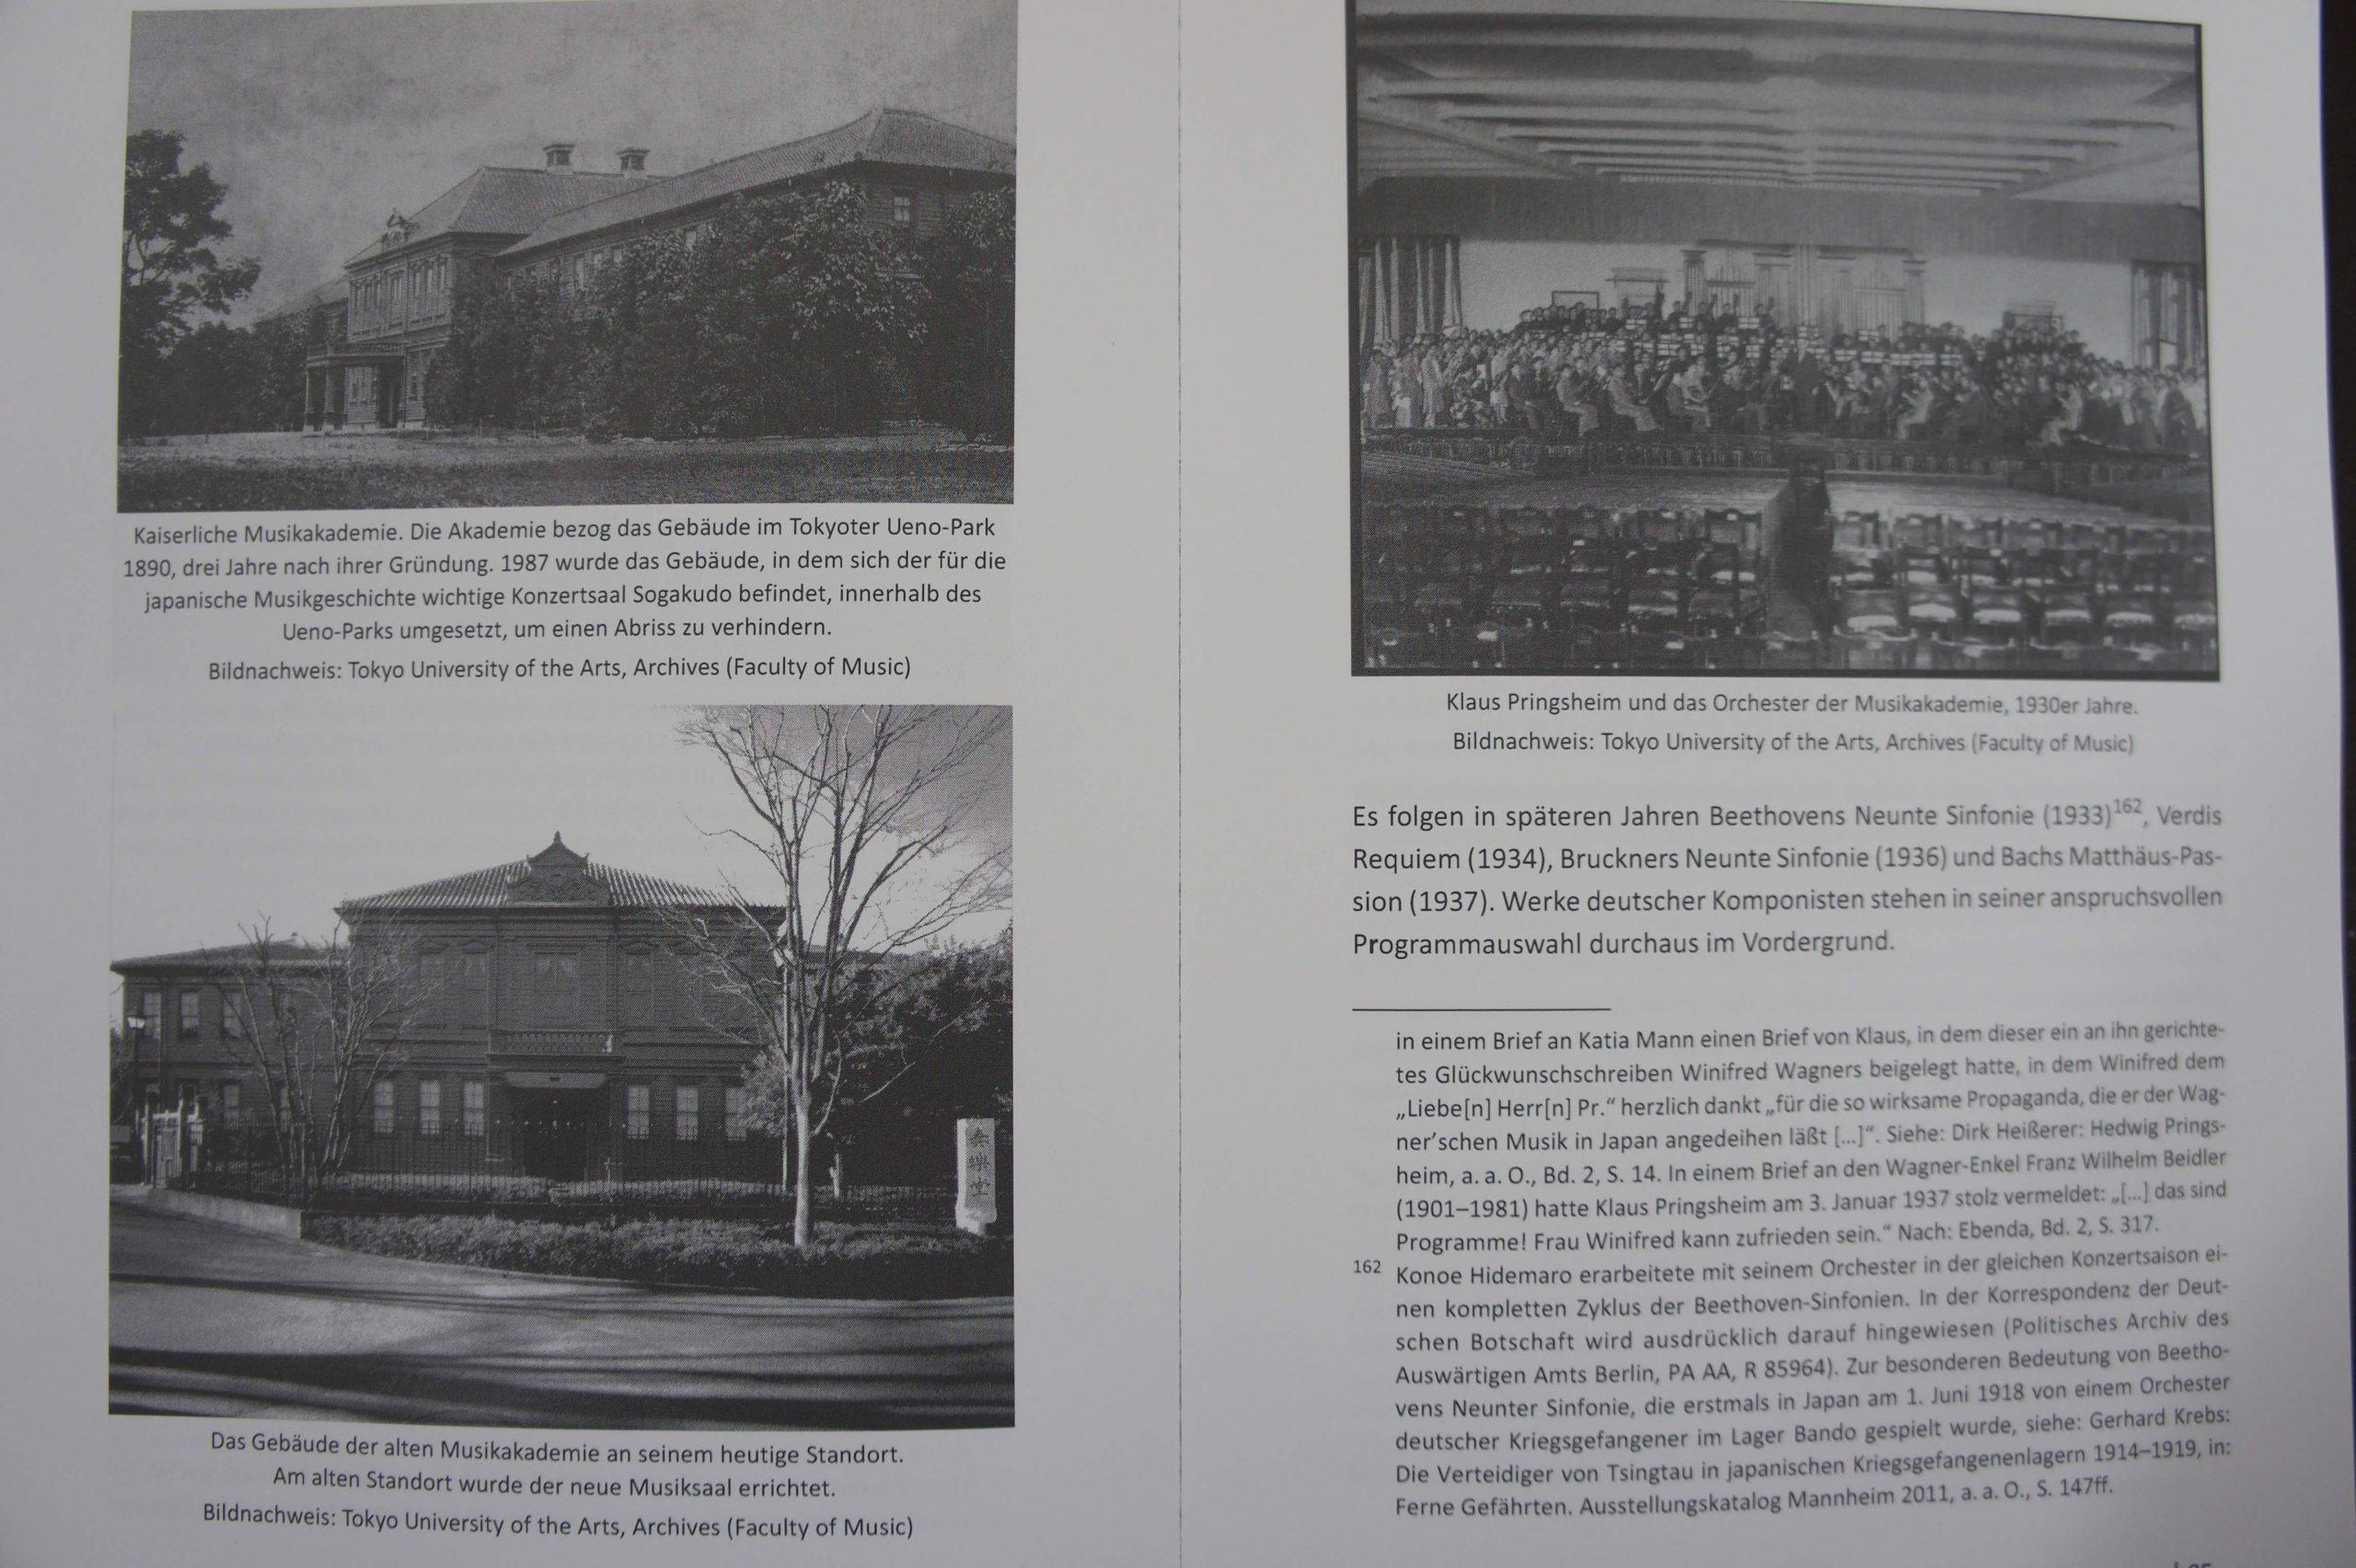 Eisinger, op.cit., pp.84-85. 音楽学校校舎や旧奏楽堂、指揮をするプリングスハイムの写真などが掲載されたページ